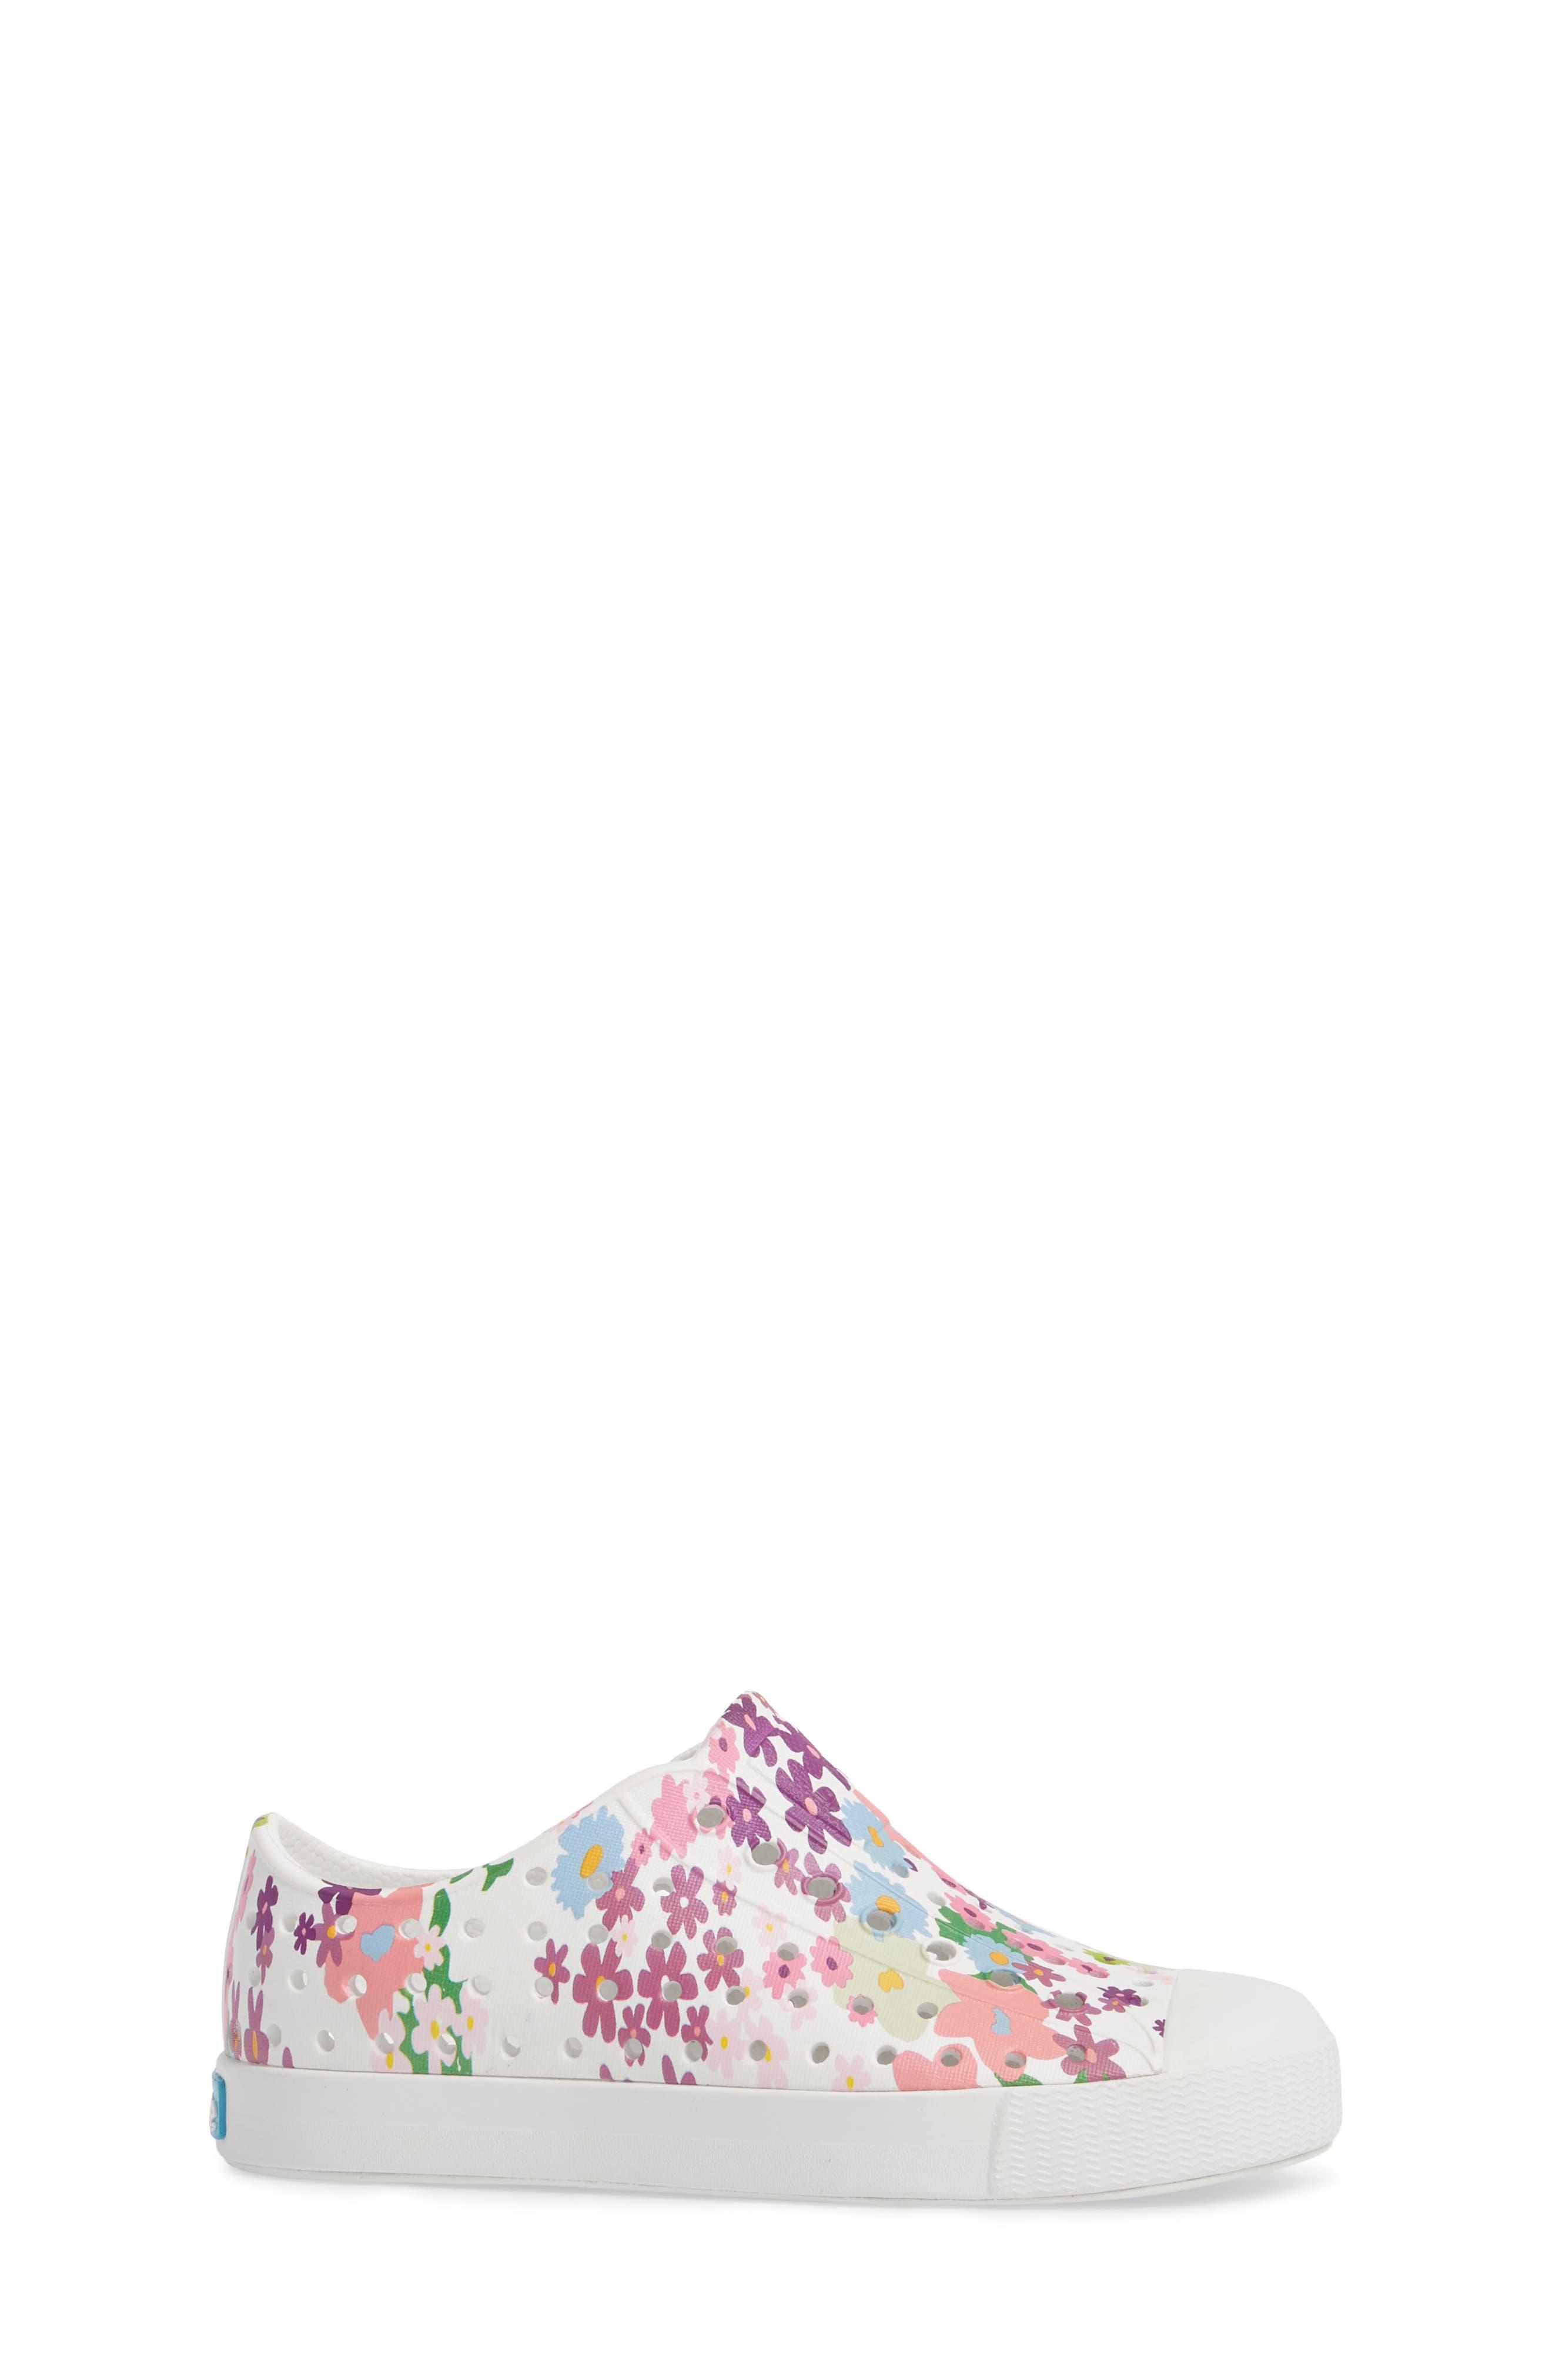 NATIVE SHOES, Jefferson Quartz Slip-On Vegan Sneaker, Alternate thumbnail 3, color, SHELL WHITE/ DAISY PRINT